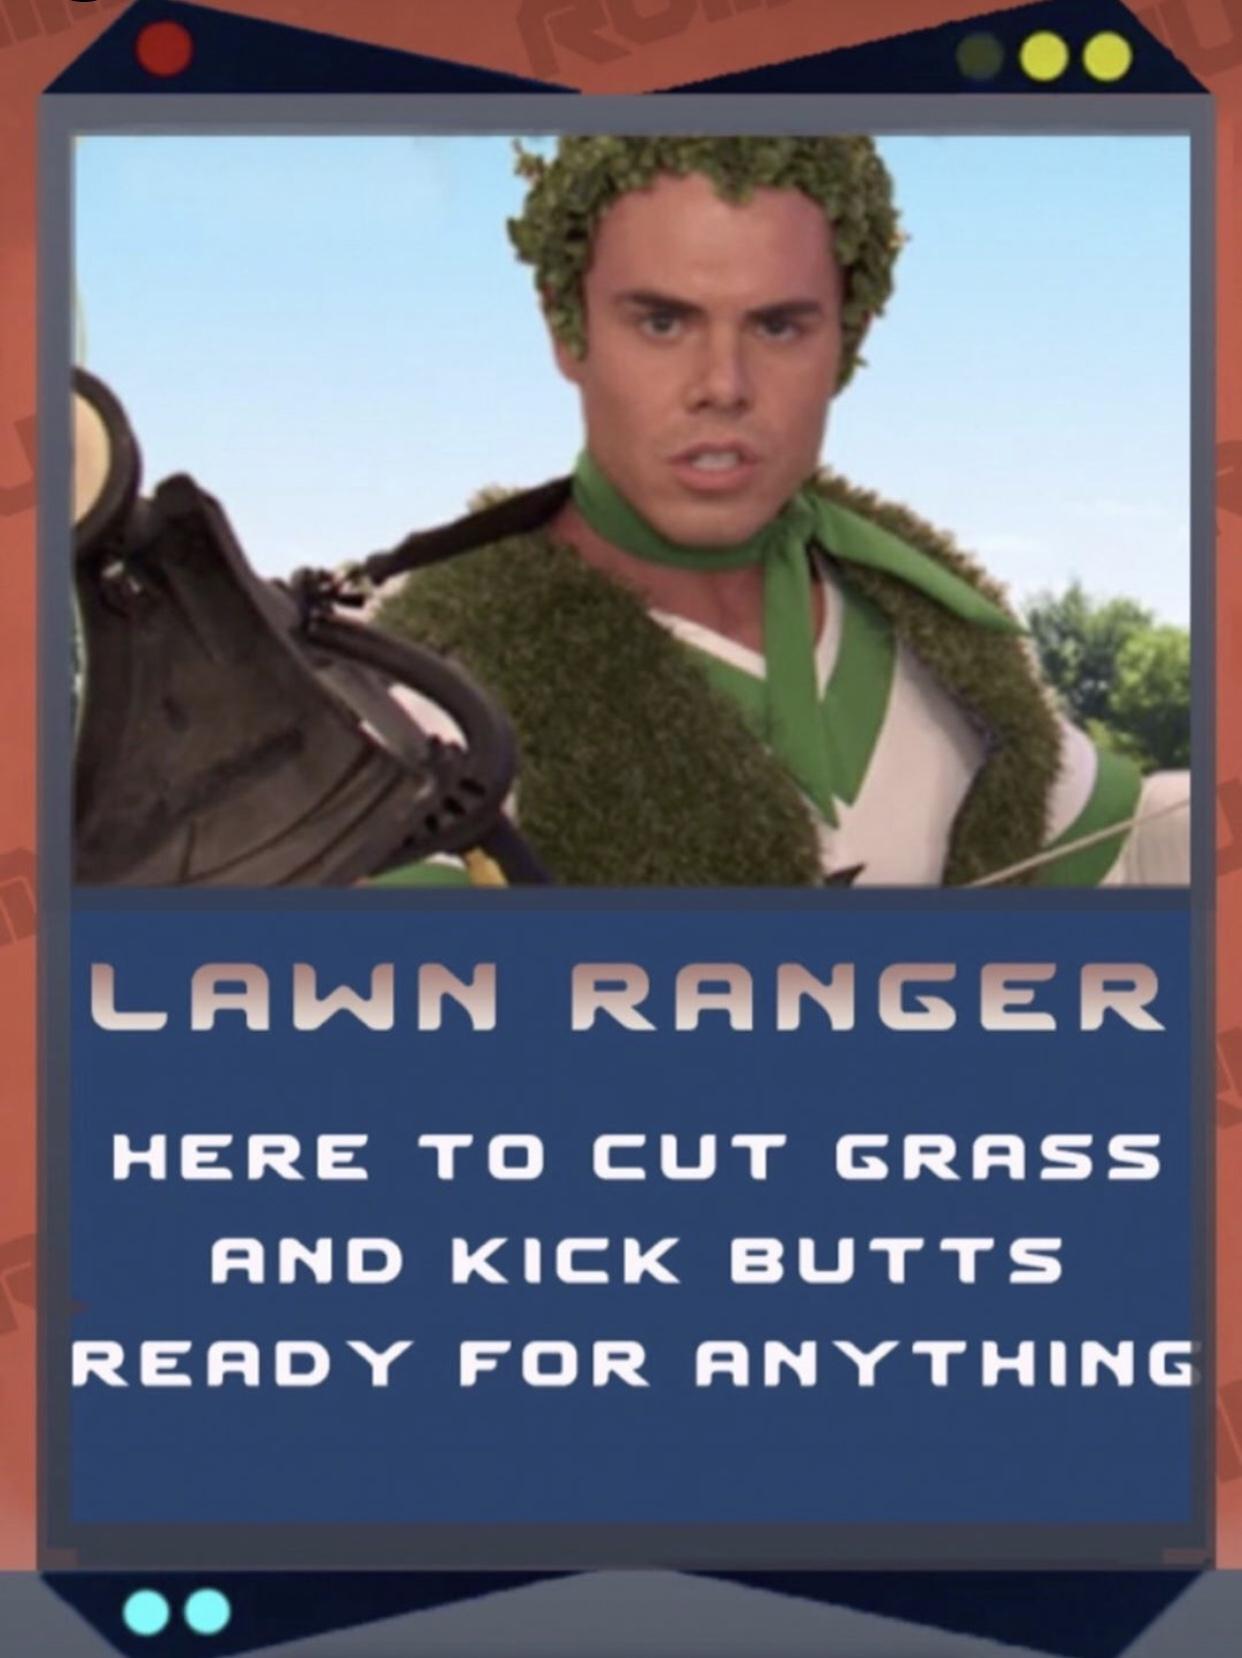 Lawn Ranger